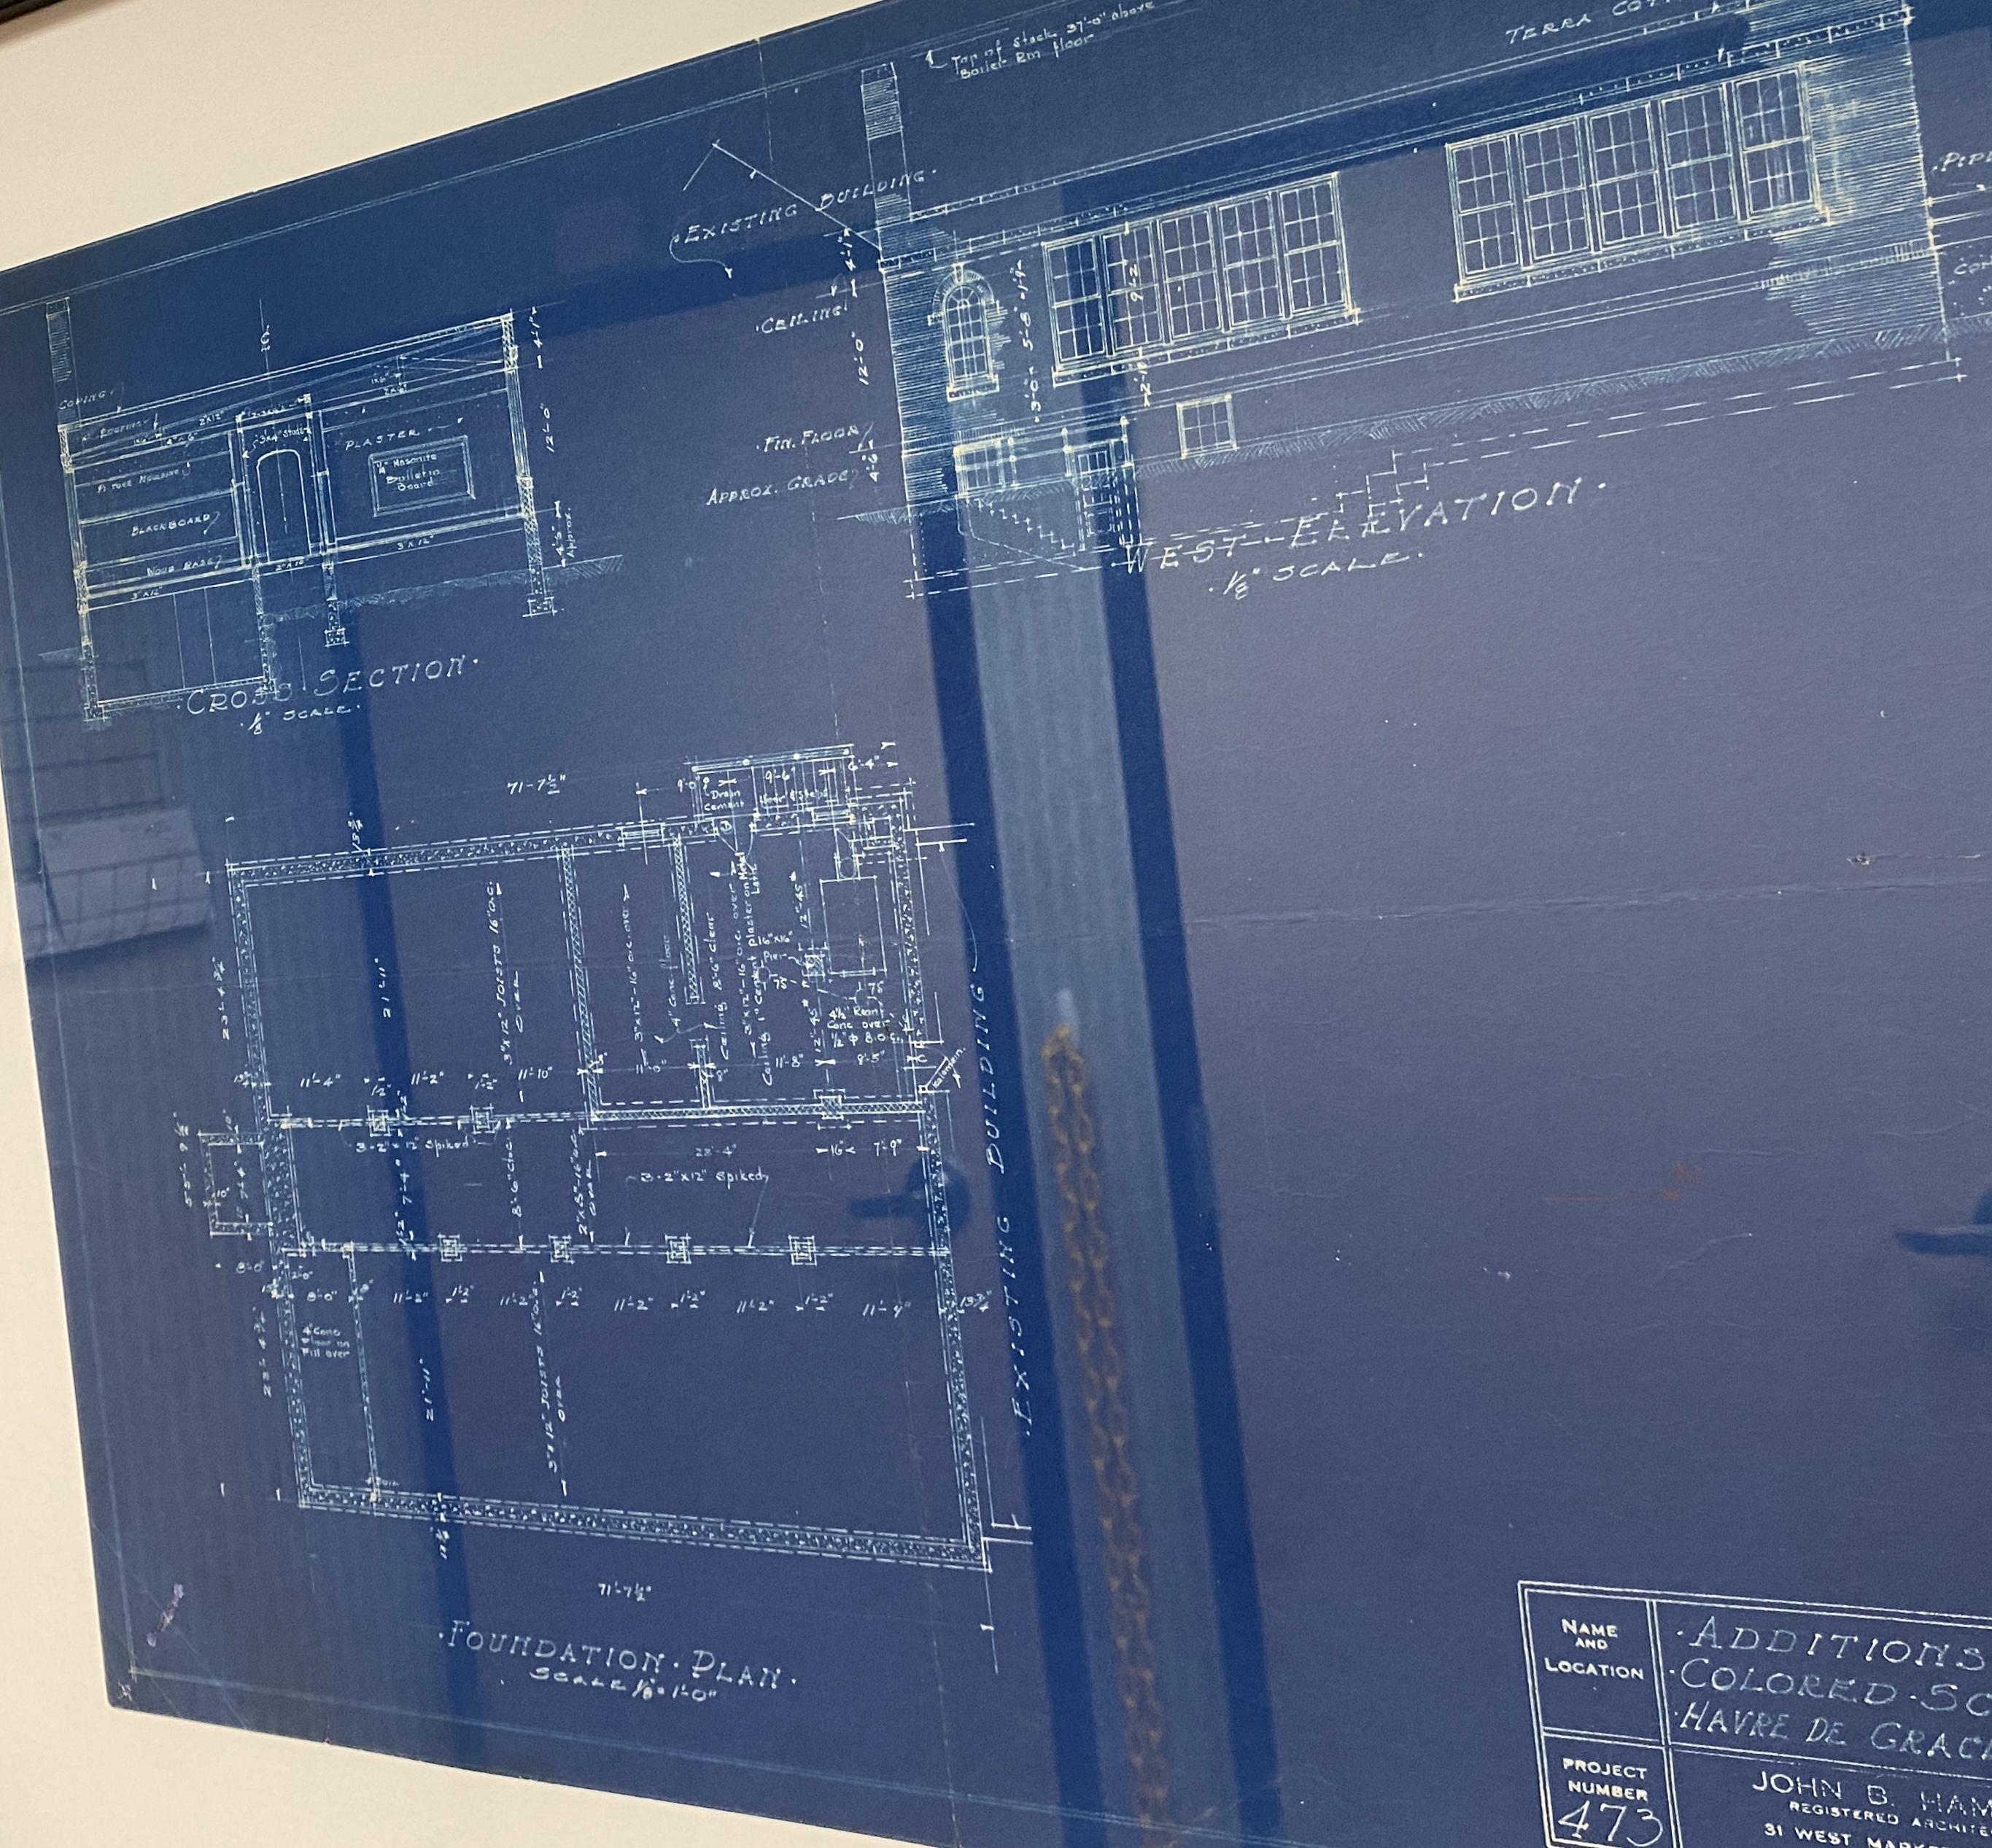 Blueprint for the original design of the Havre de Grace Colored School